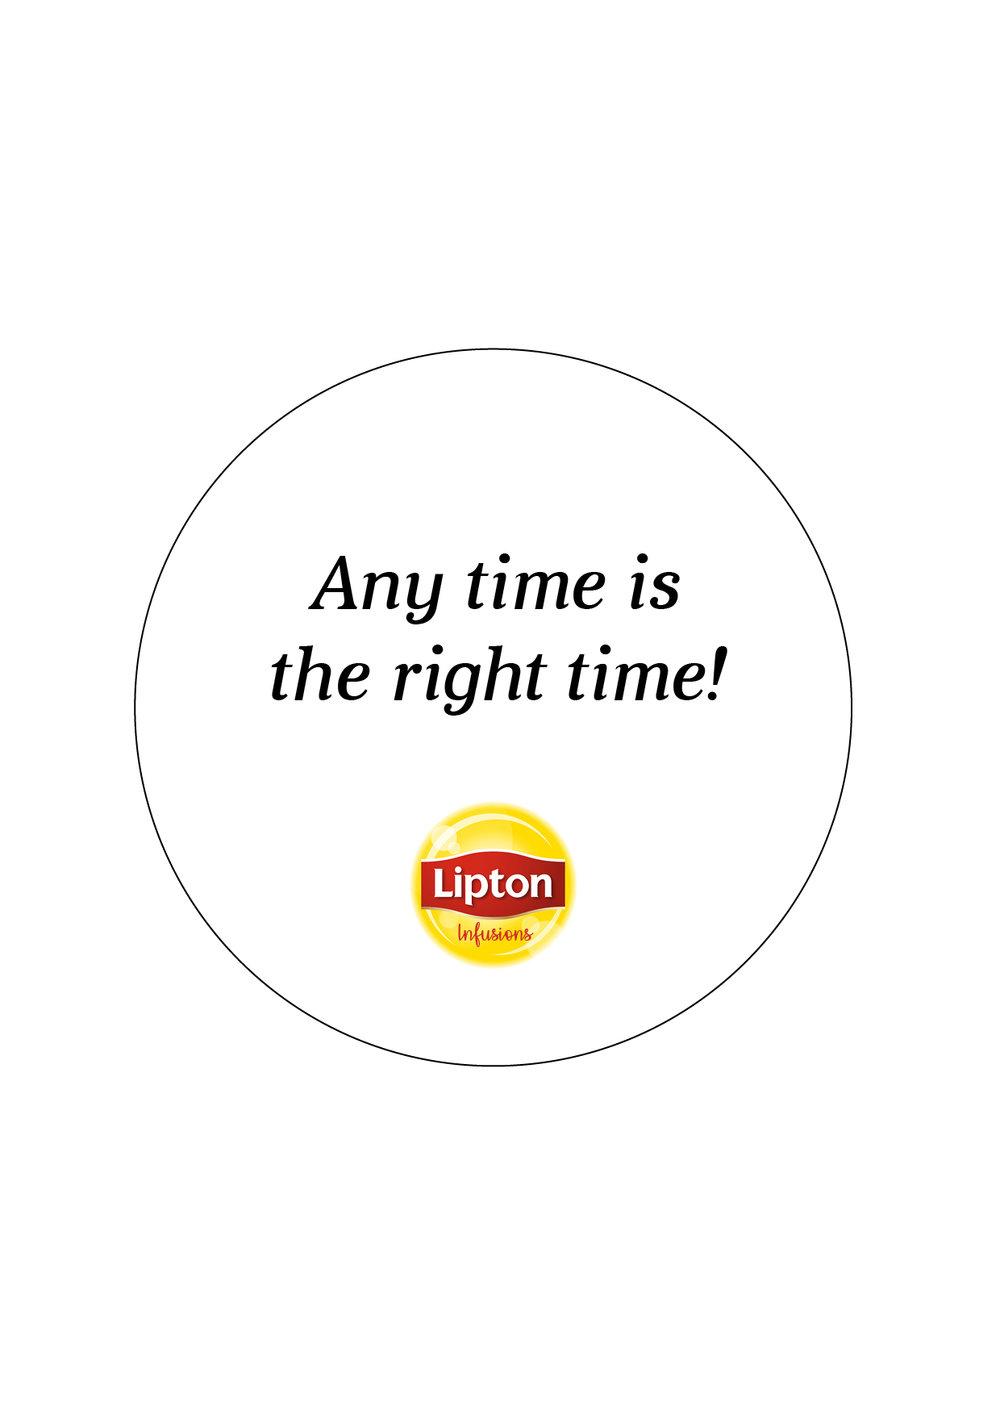 lipton website.jpg